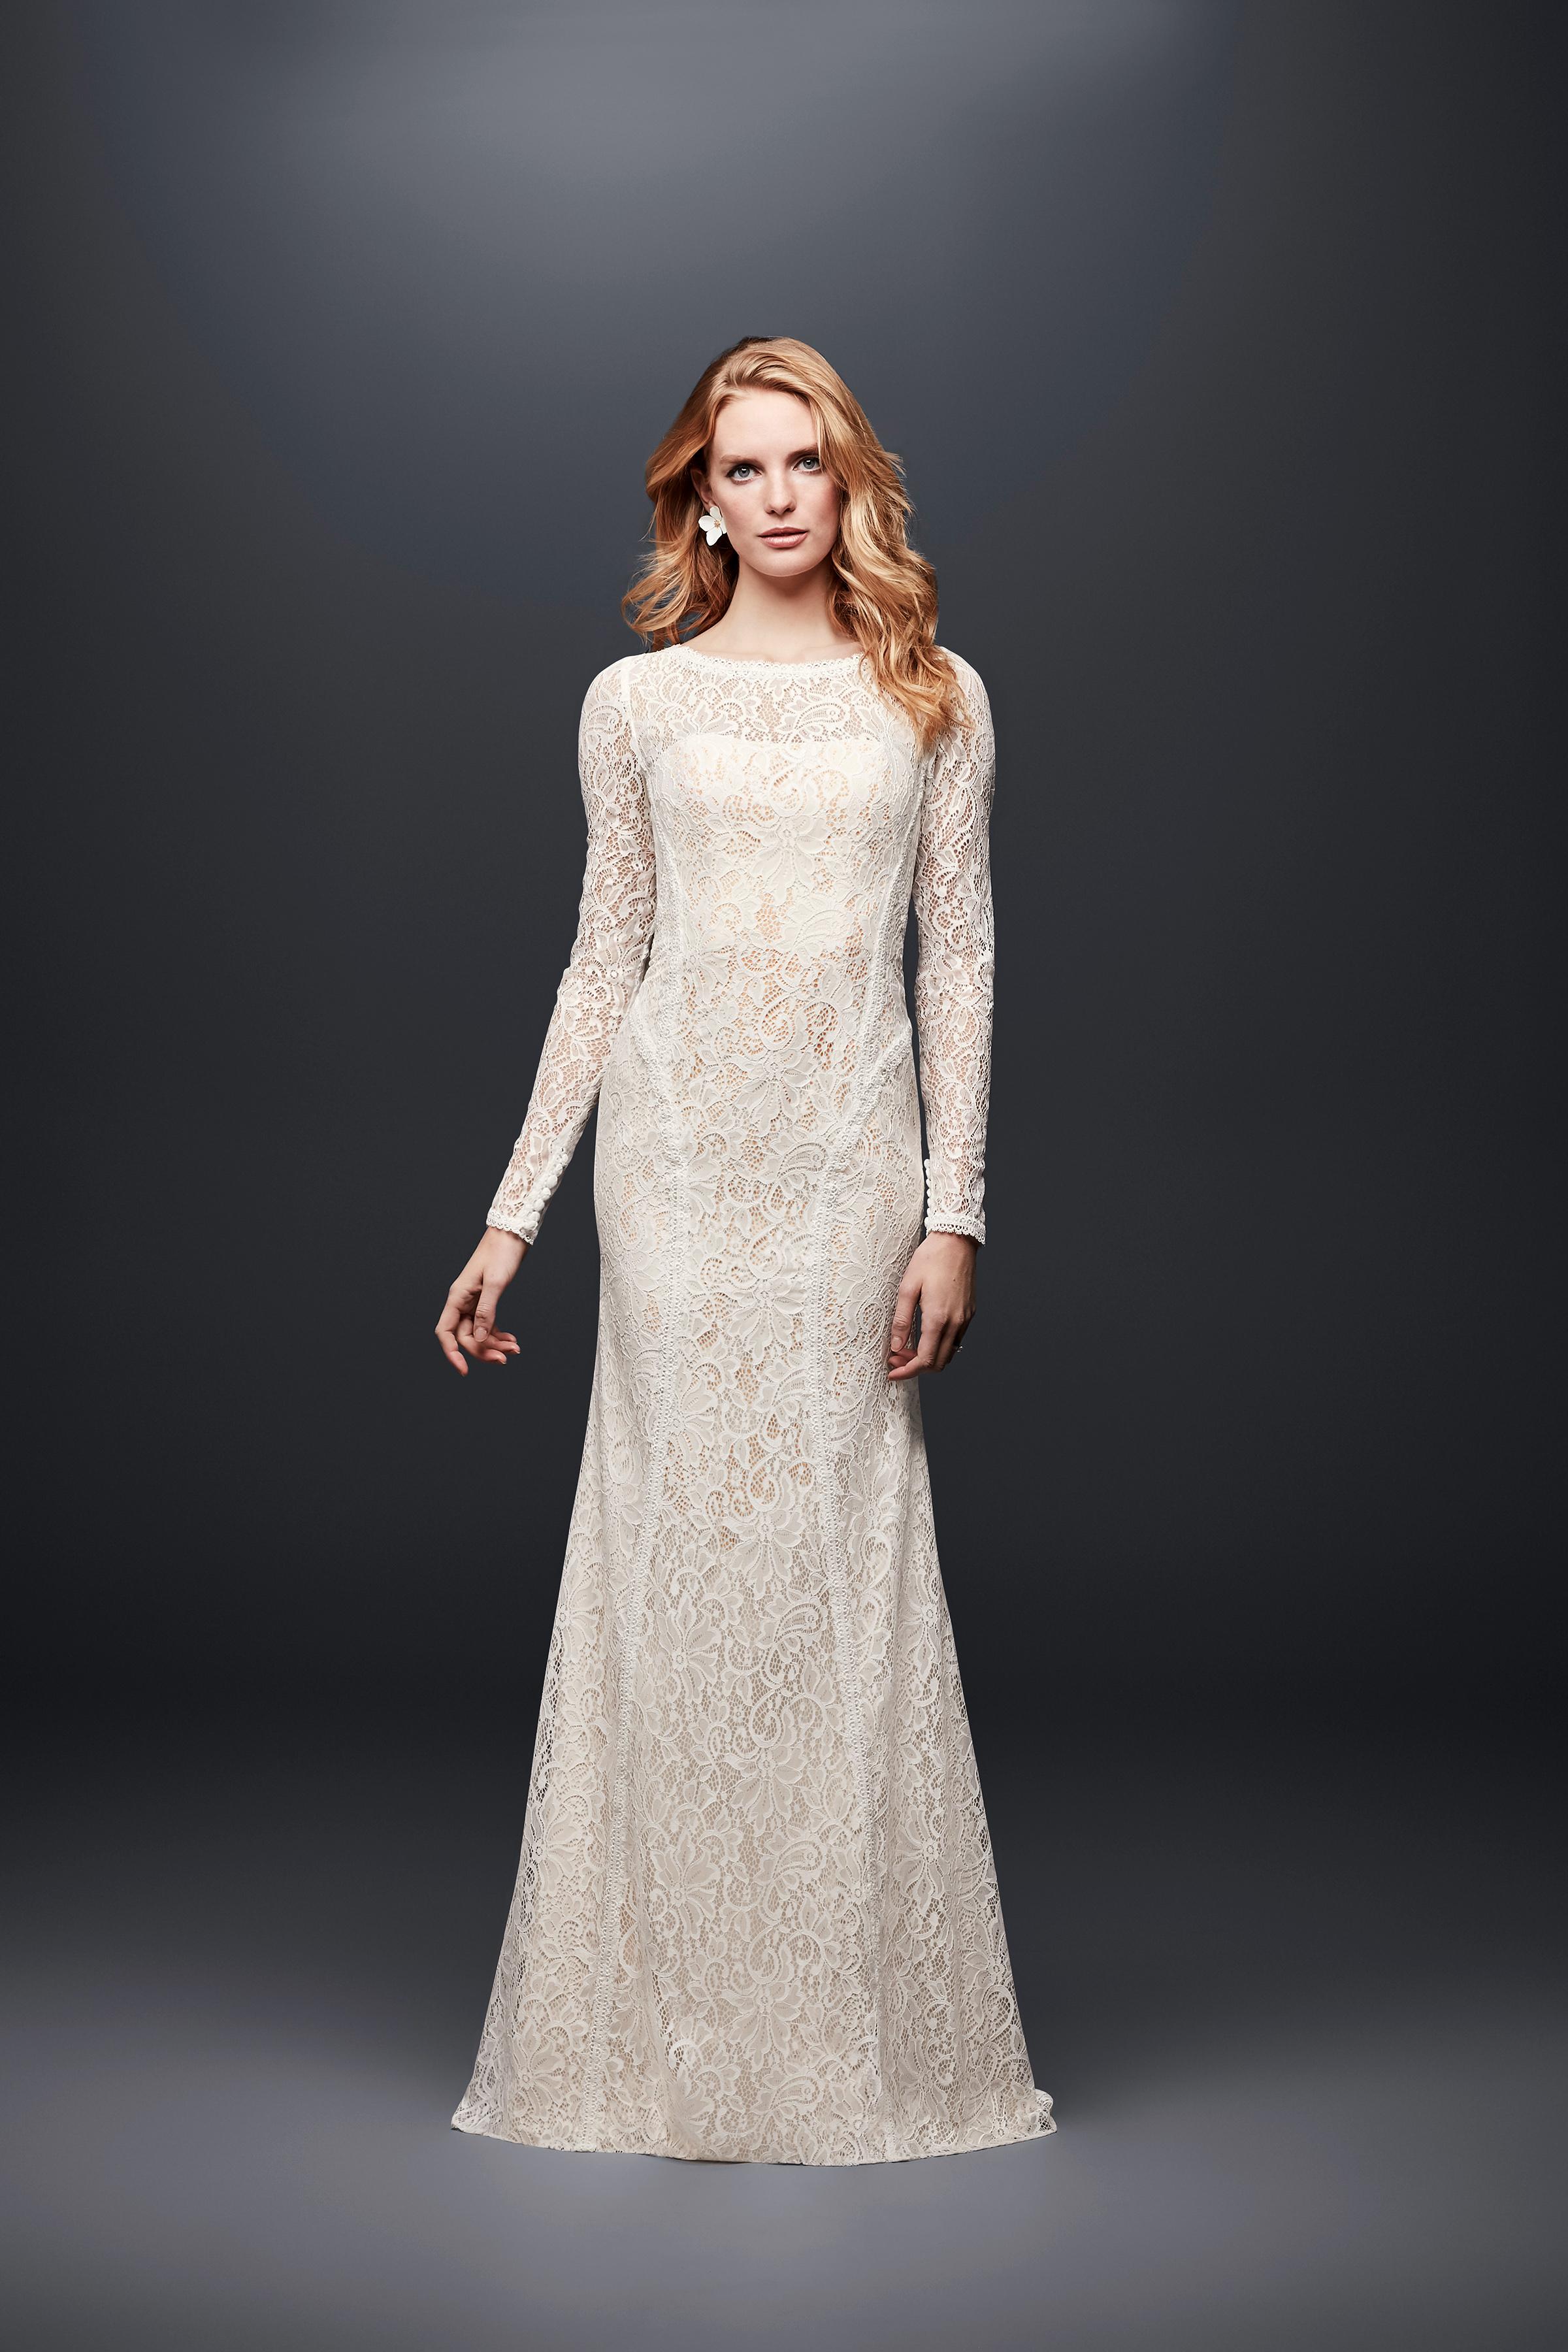 david bridal wedding dress spring 2019 long sleeves lace high neck